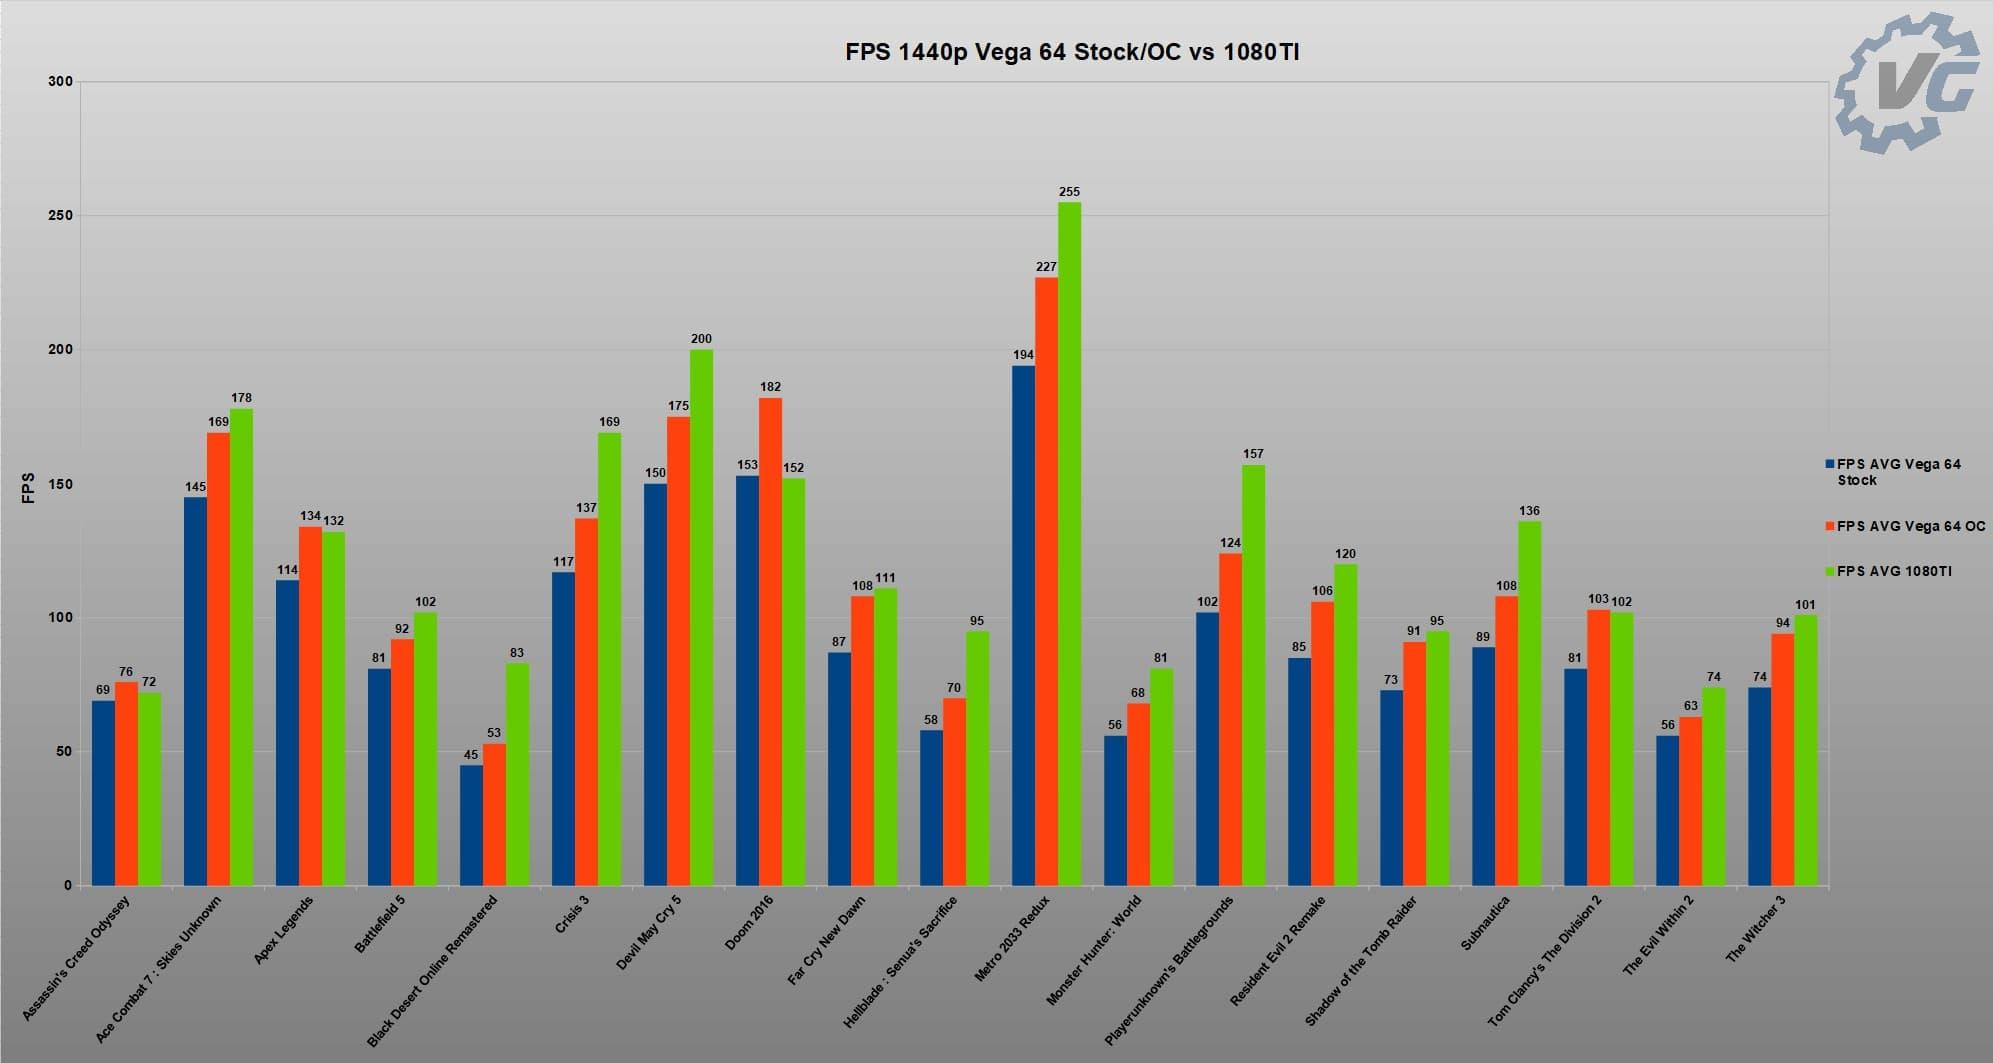 Graphique comparatif Vega 64 Vs 1080 Ti